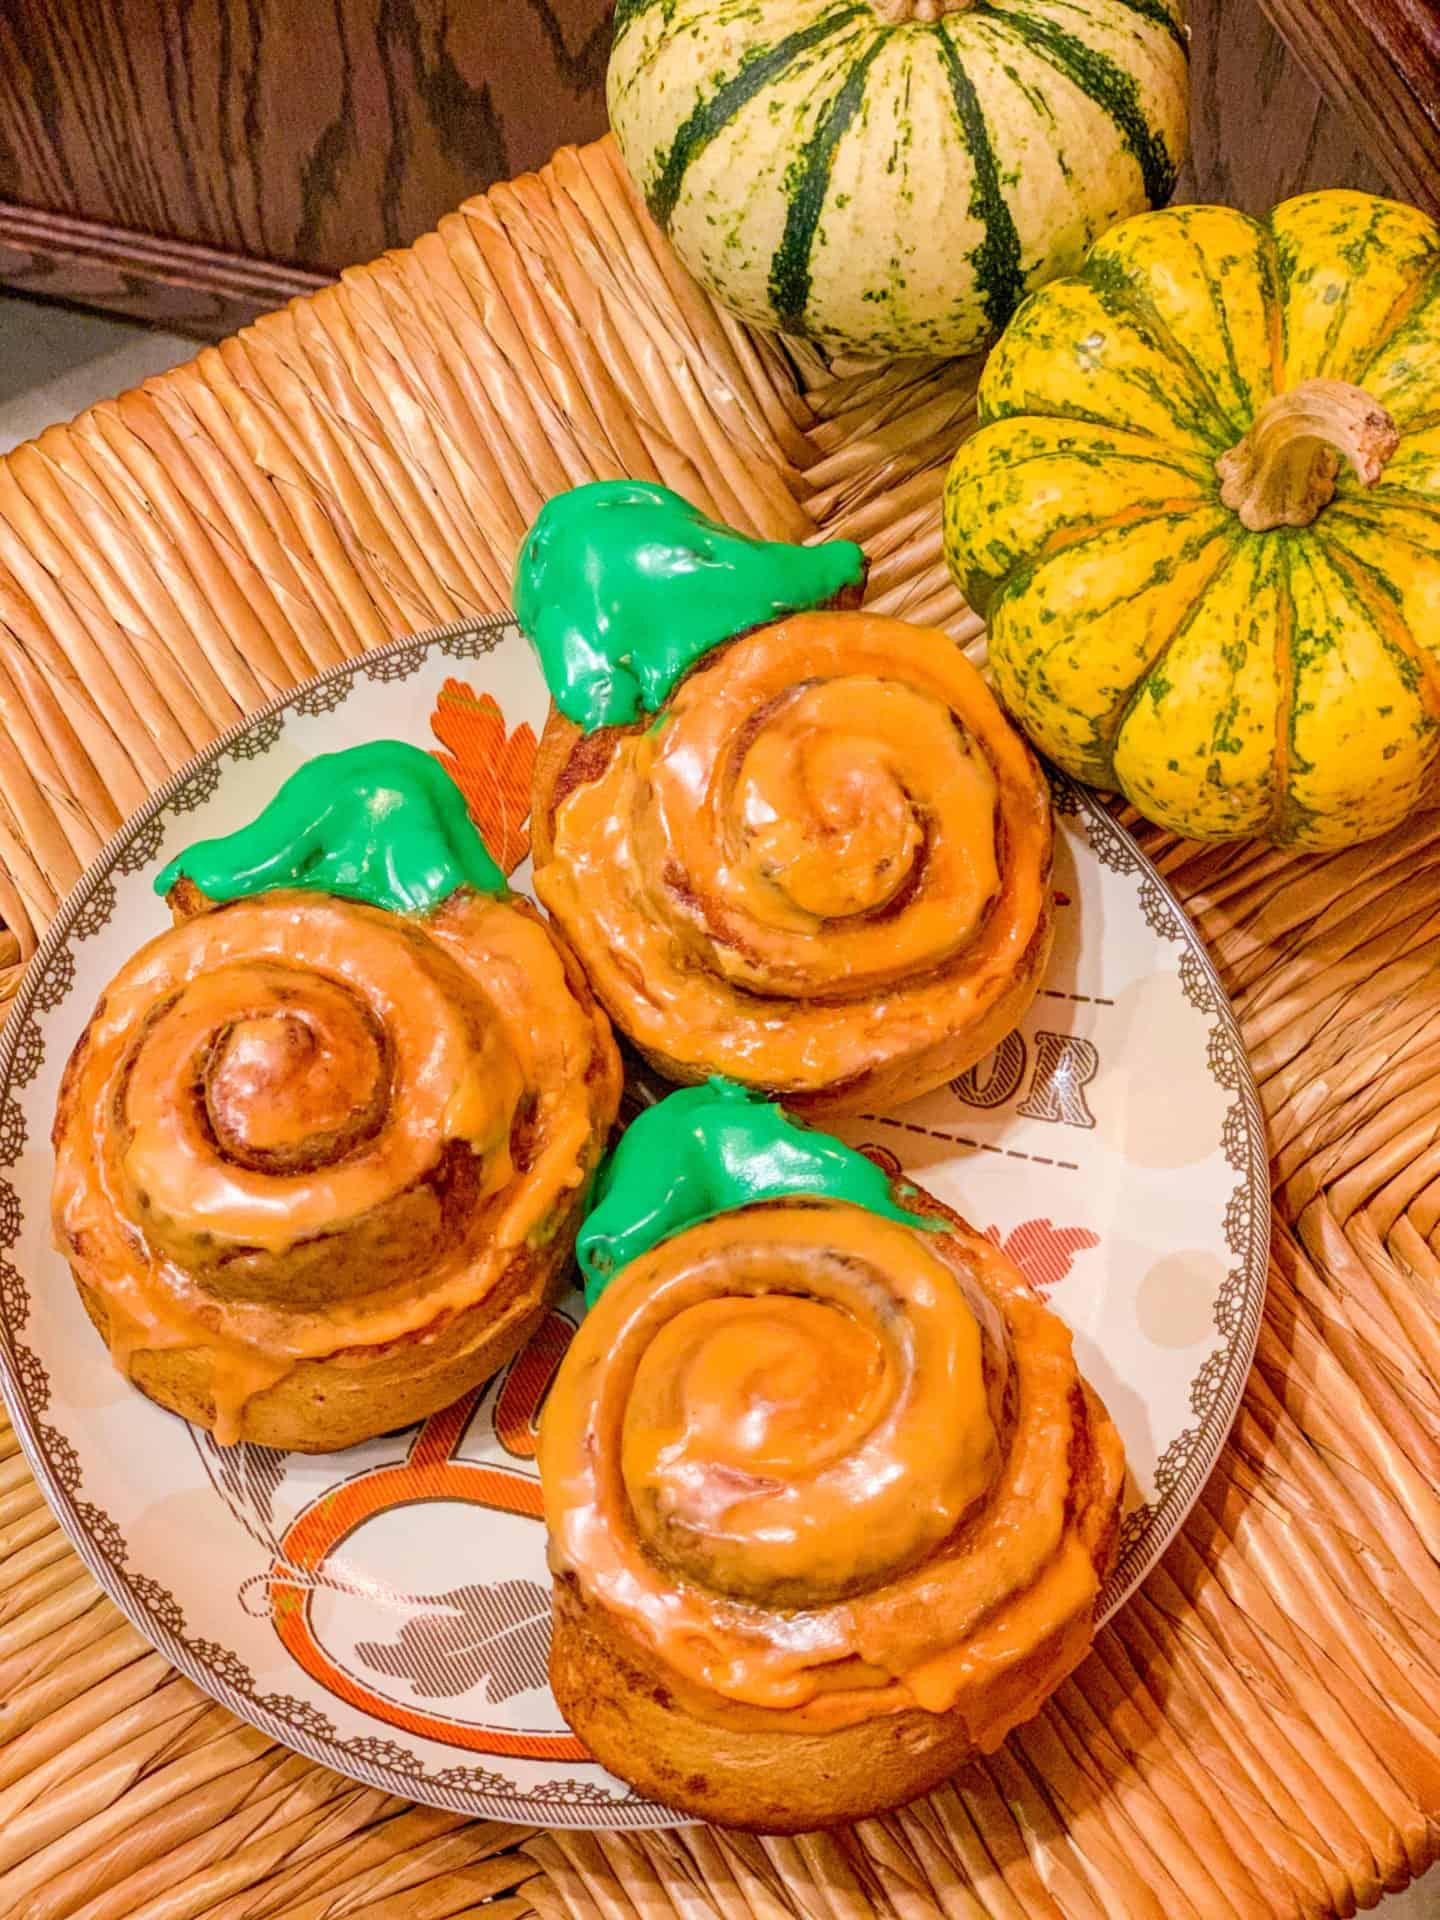 Pillsbury Grands pumpkin cinnamon rolls